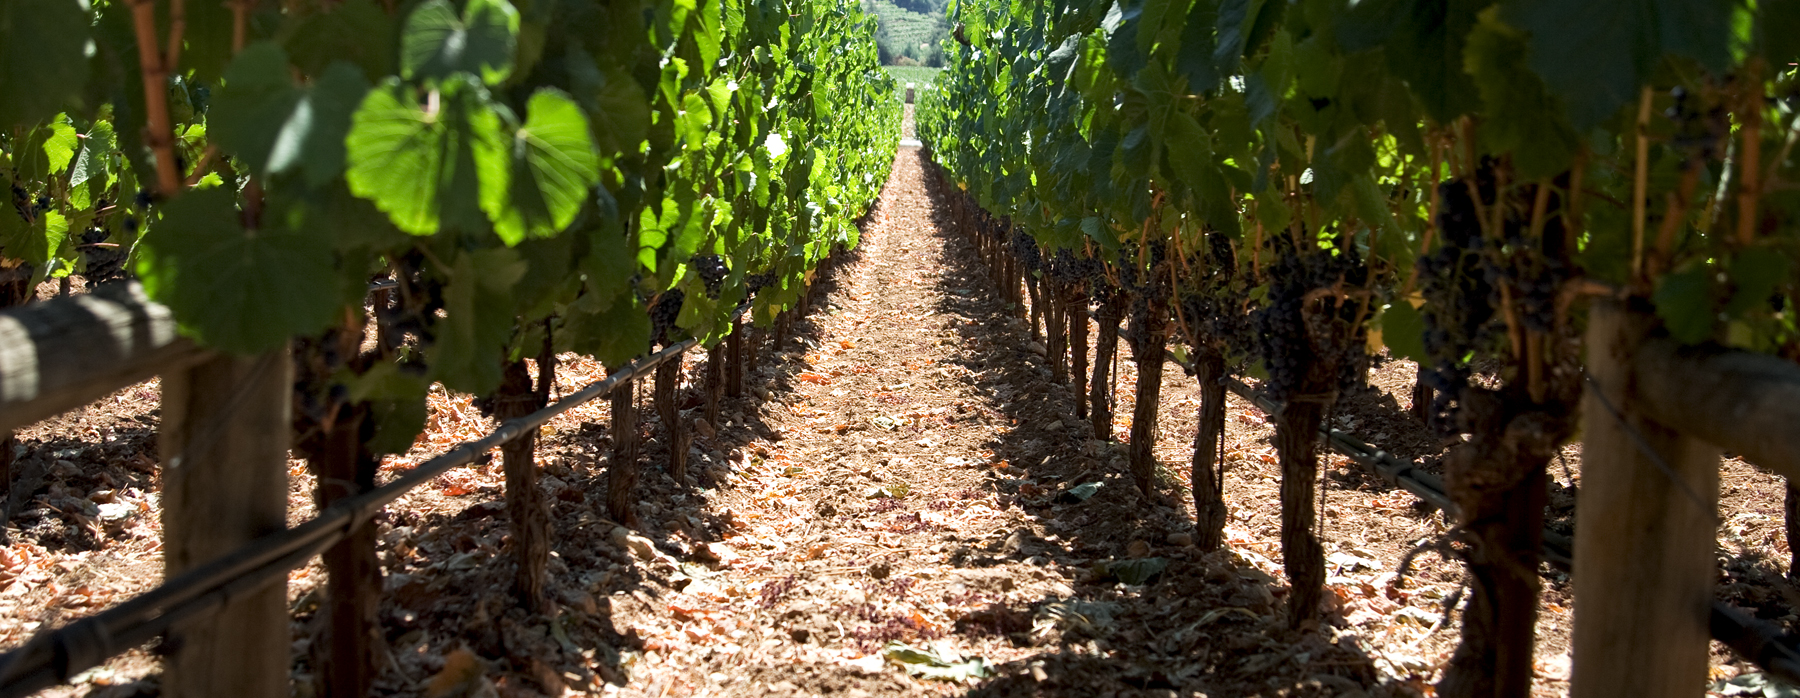 Rudd-Cabernet-Sauvignon-Vines.jpg